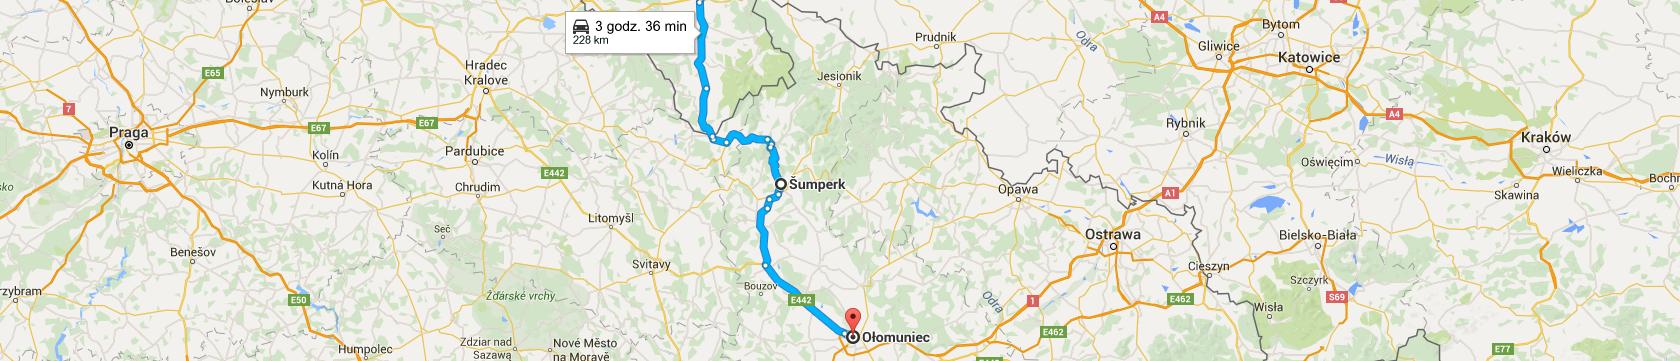 Trasa do Ołomuńca przez Šumperk